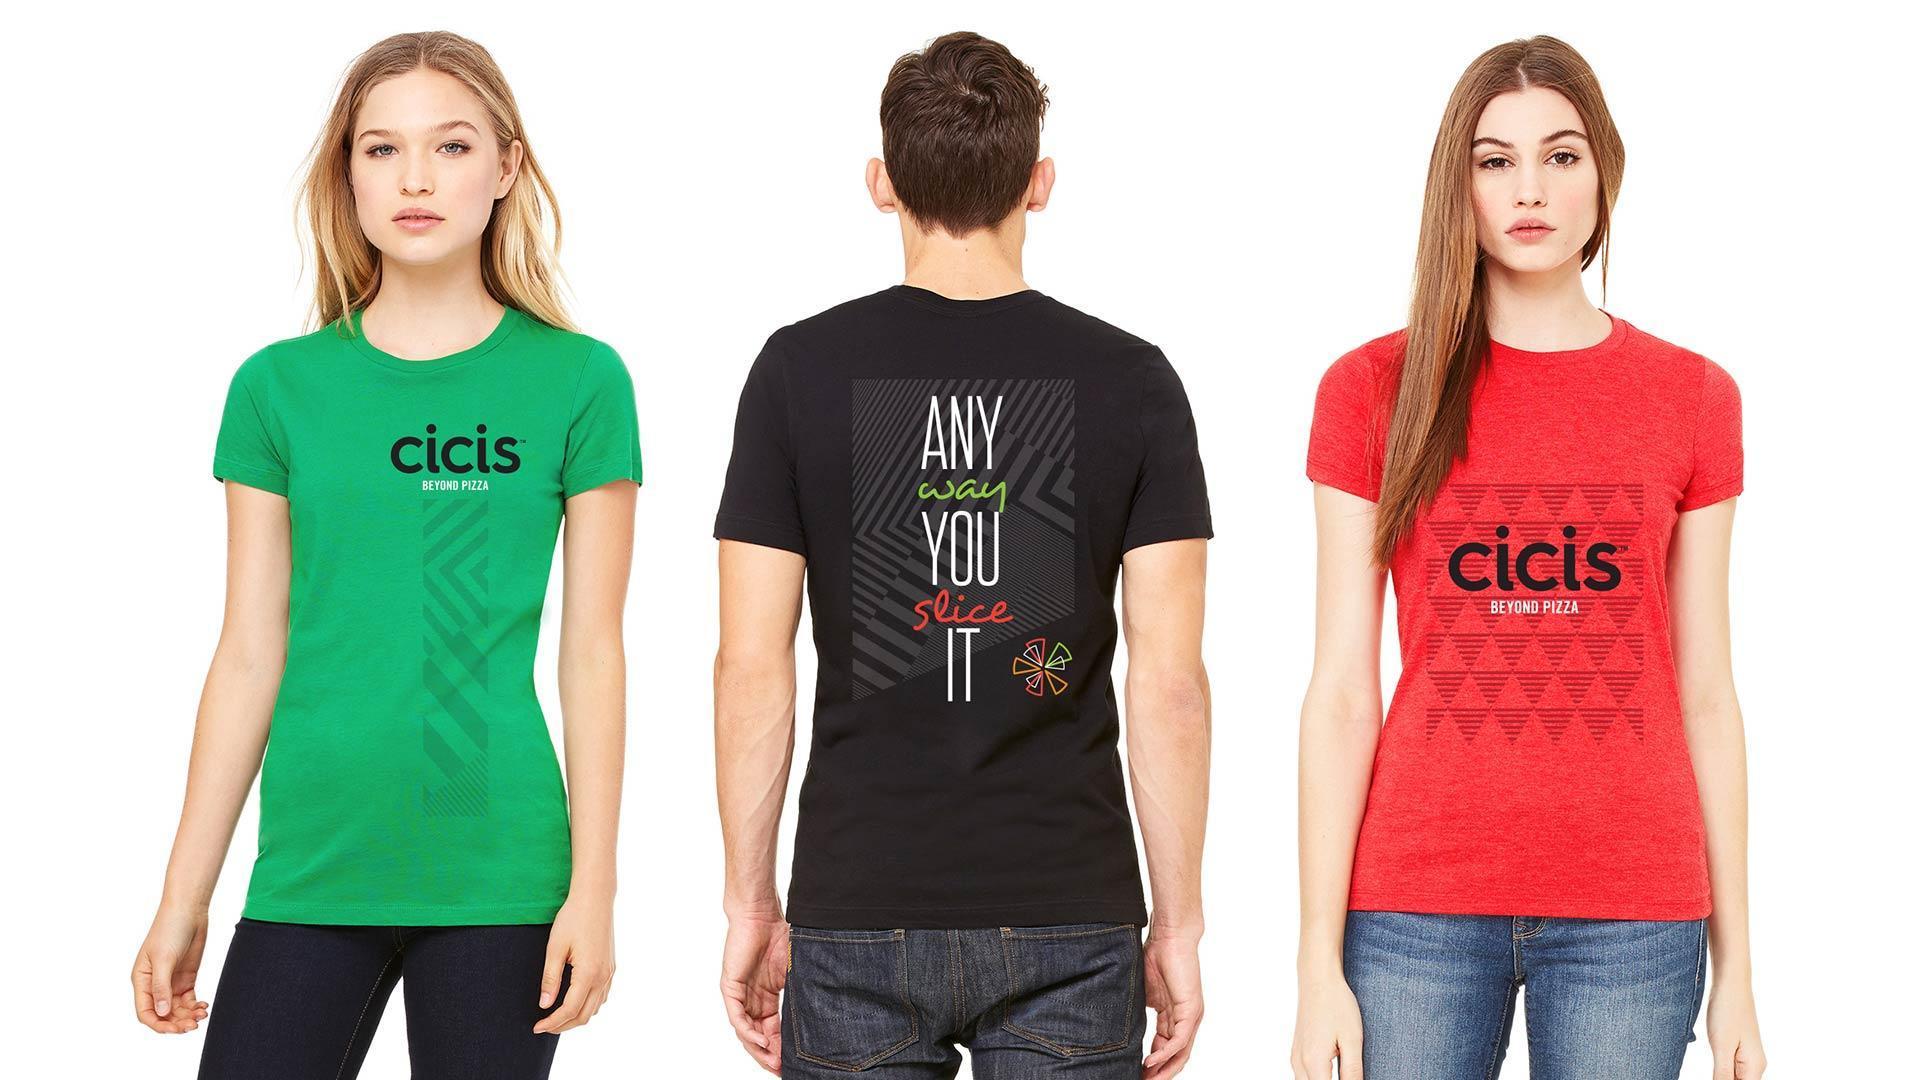 cicis-brand-identity-uniforms